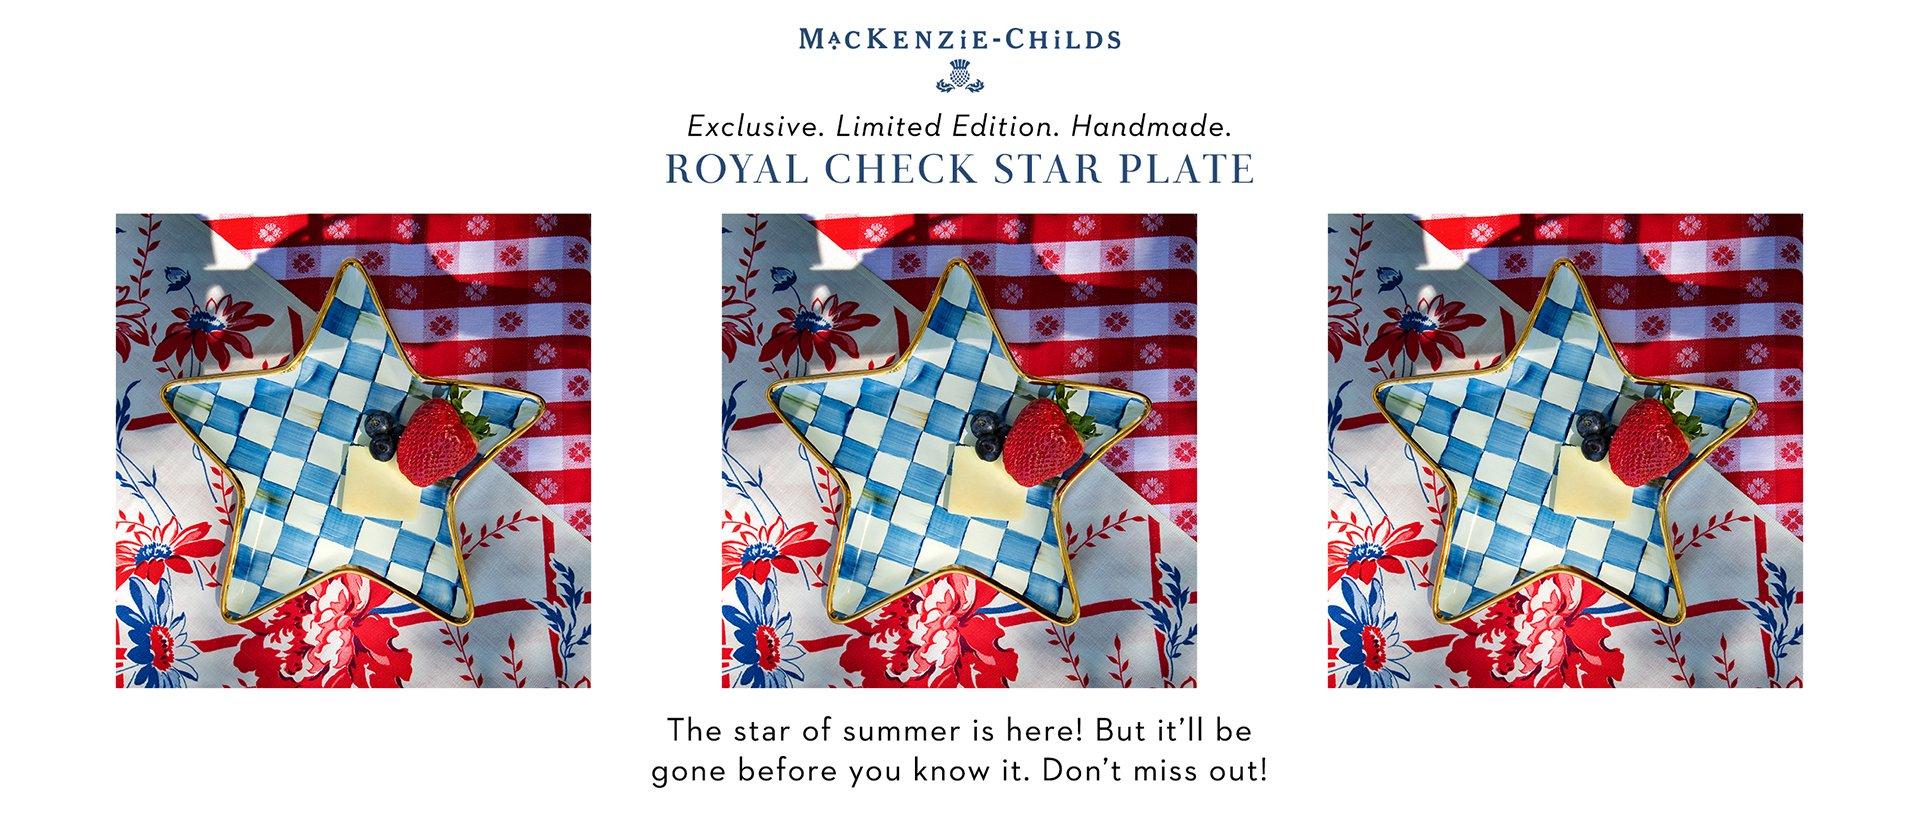 Royal Check Star Plate